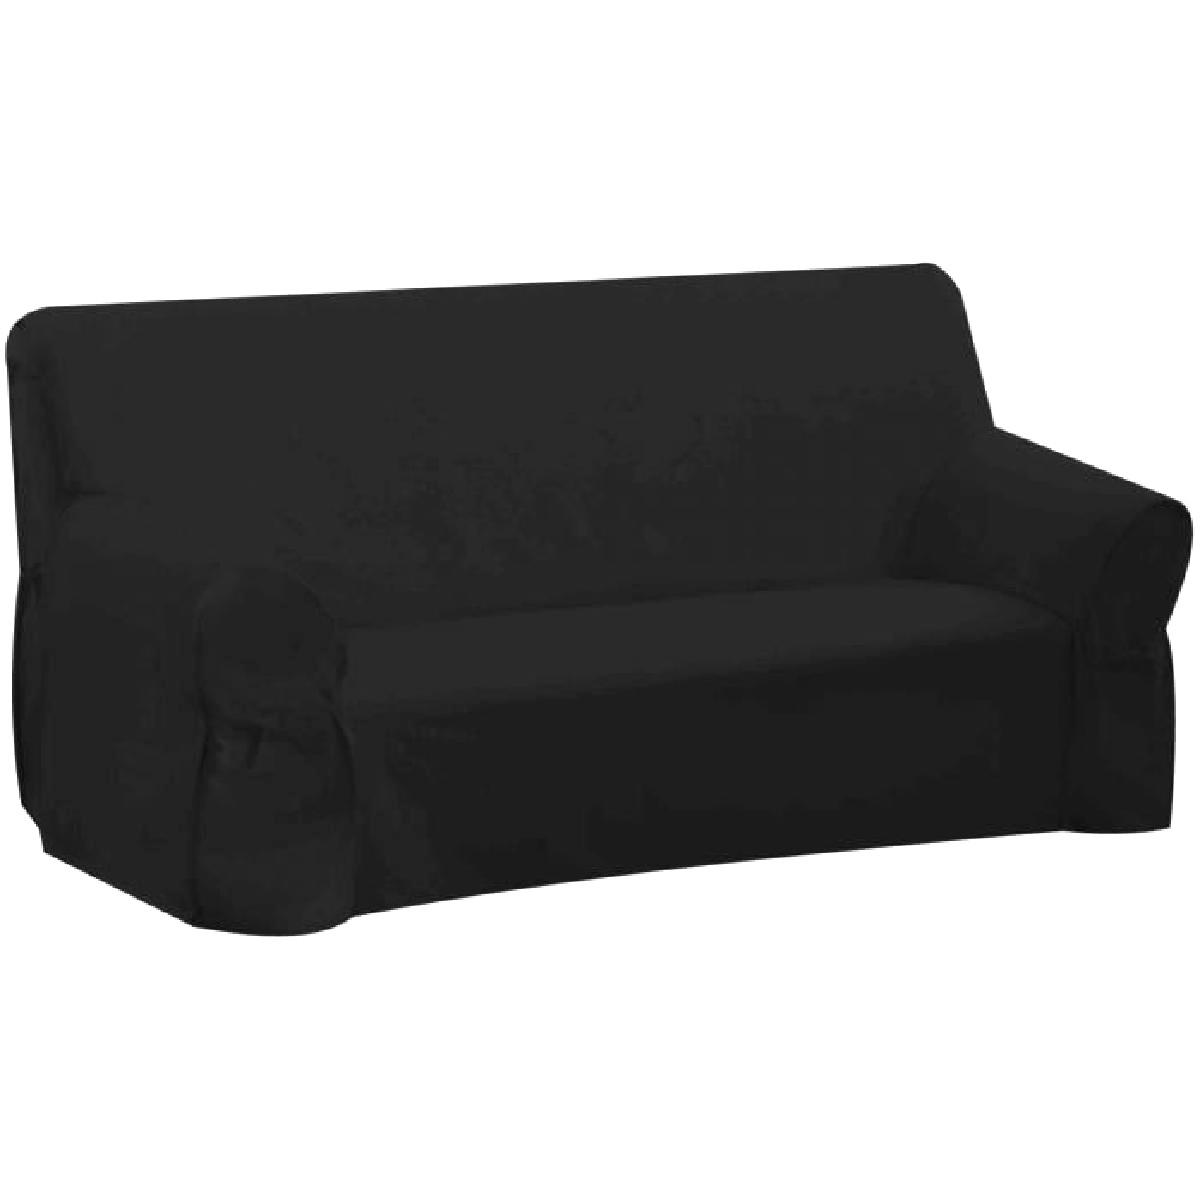 Housse Canapé Friheten Beau Images Awesome sofa 1 Place S Joshkrajcik Us Joshkrajcik Us Avec